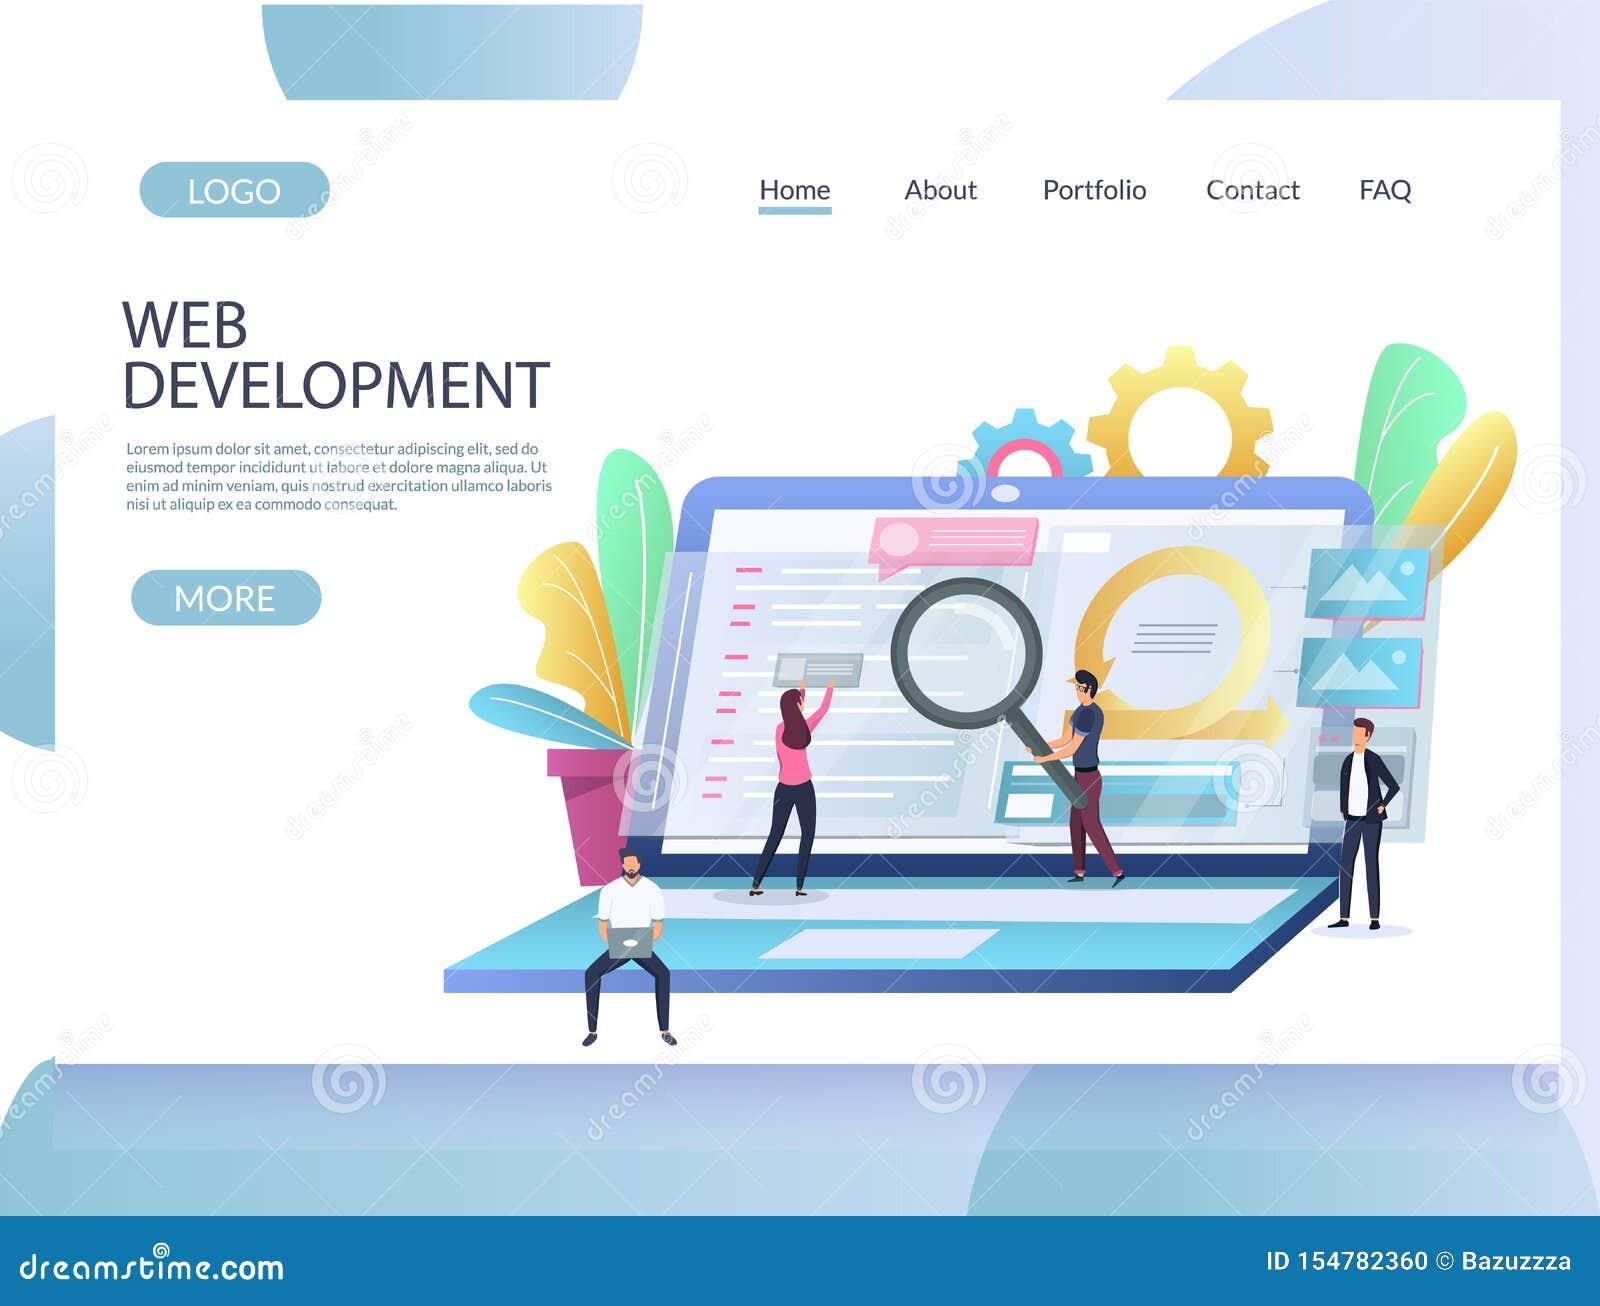 Web Development Vector Website Landing Page Design Template Stock Vector Illustration Of Design Page 154782360